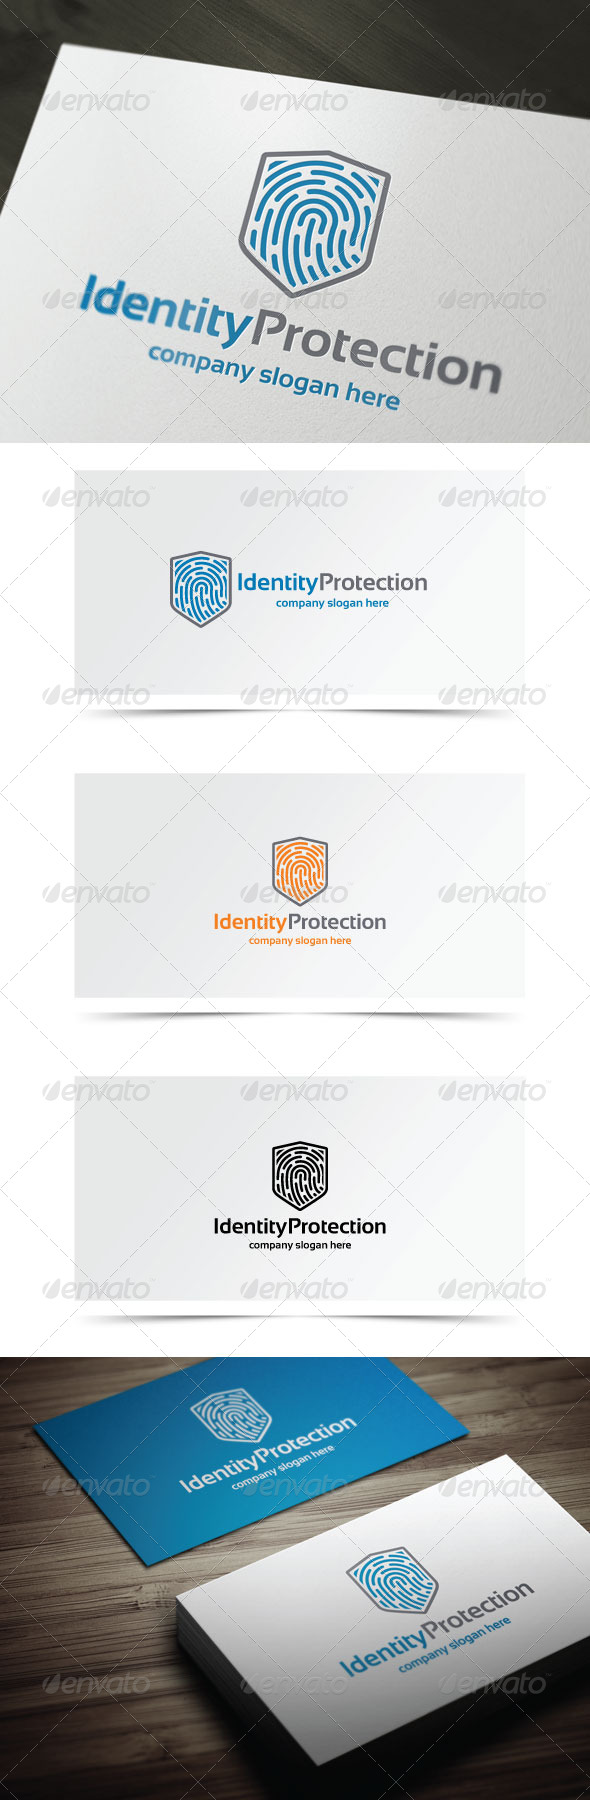 GraphicRiver Identity Protection 8049417